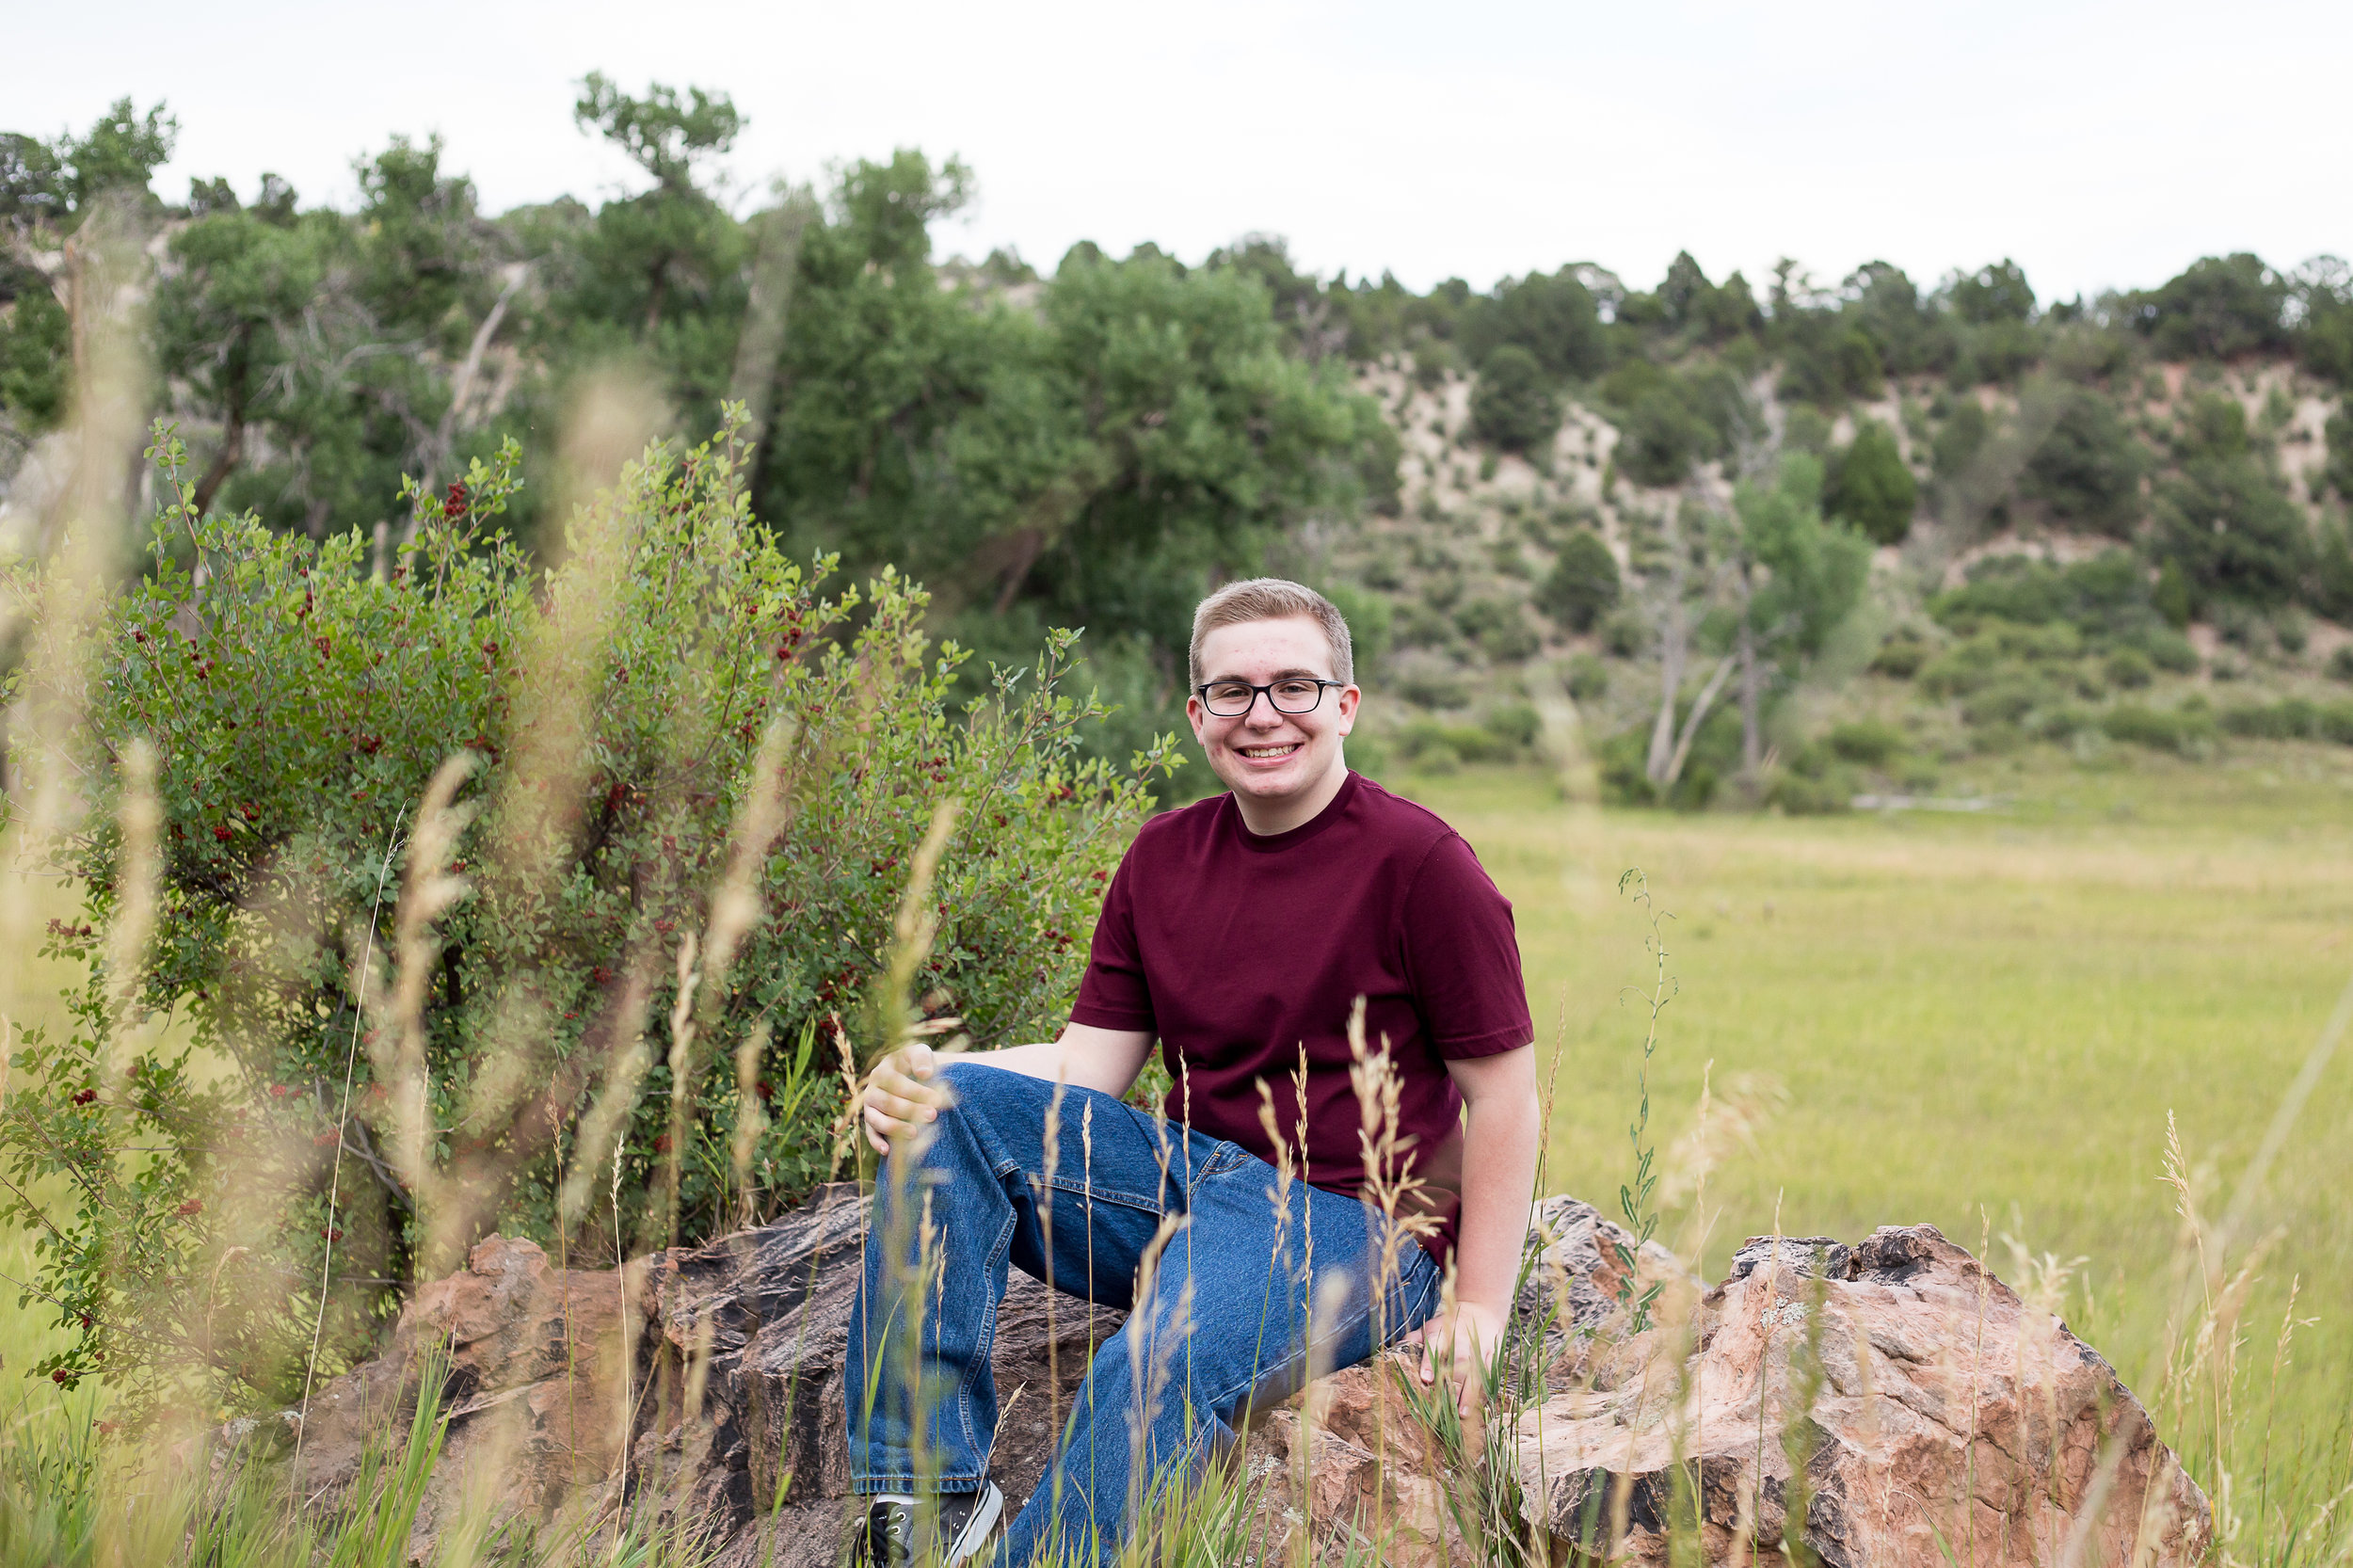 Colorado Springs High School Senior Photo Session  in Garden of the Gods Park | Stacy Carosa Photography | Colorado  Springs Senior Portrait Photographer